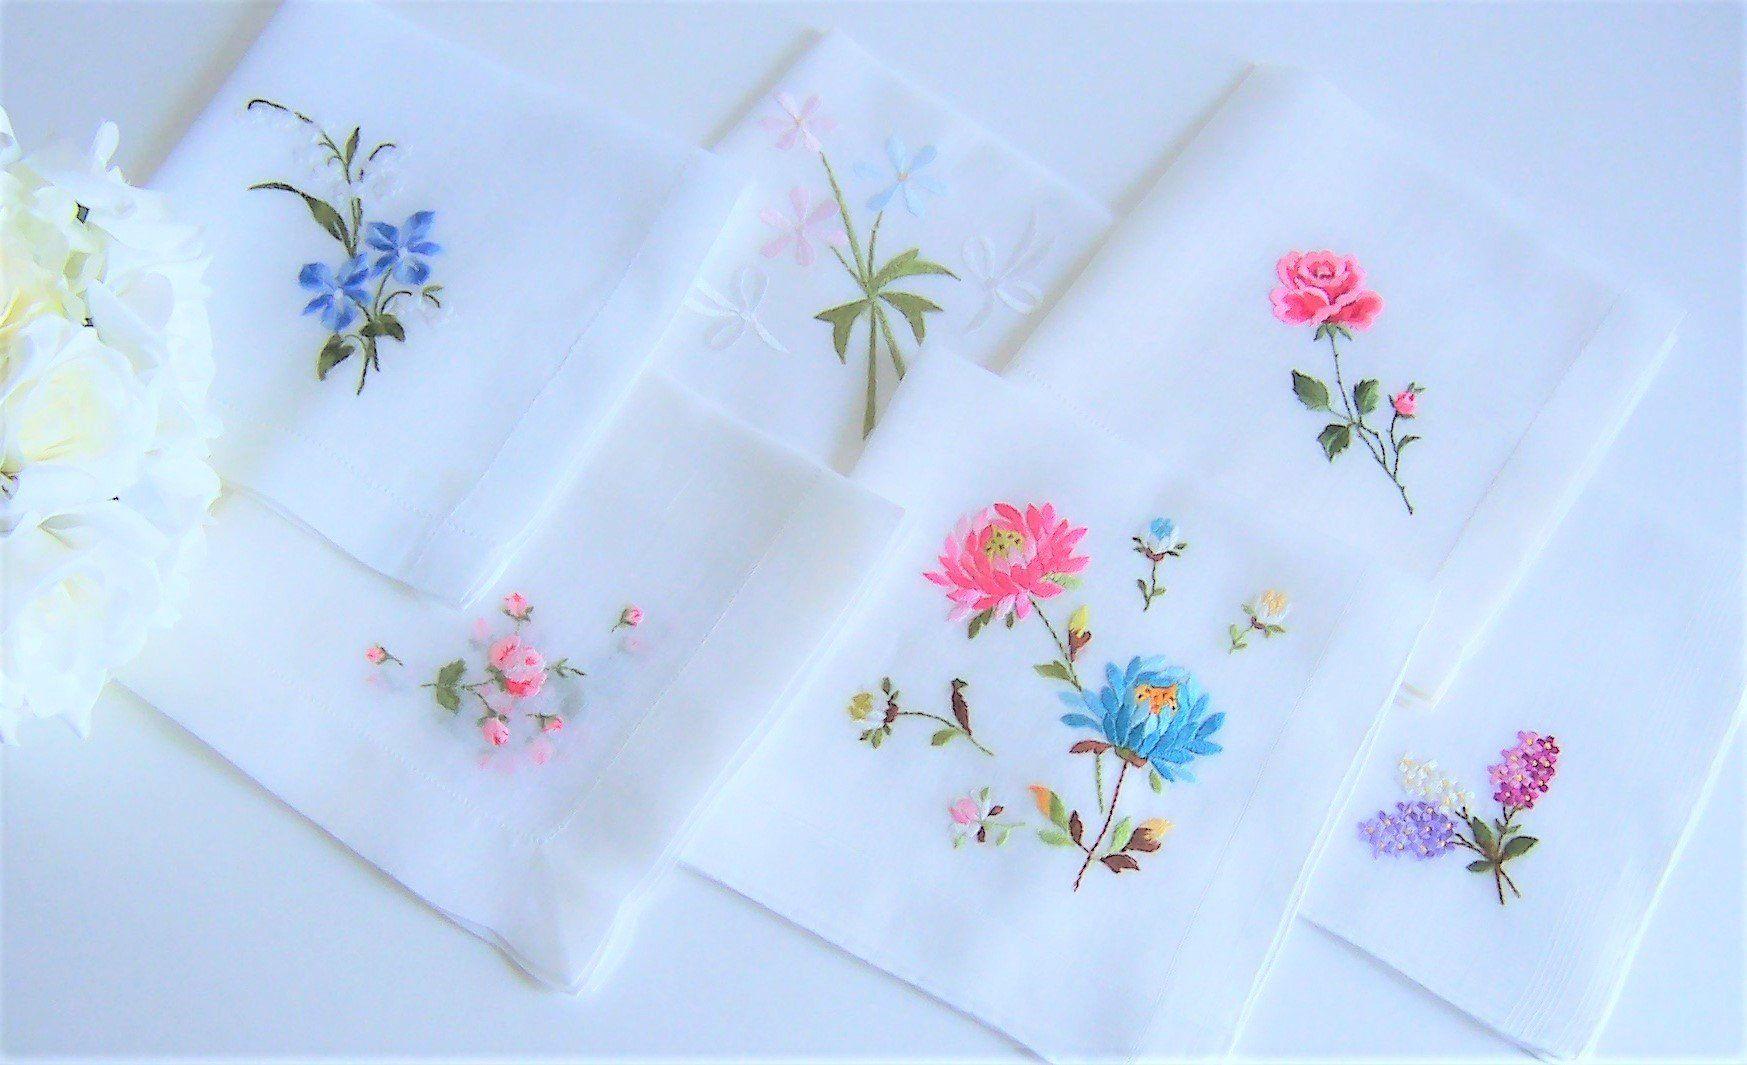 Happy Tears Bridal Shower Gift Blue Floral Applique 1950/'s Antique Heirloom Hanky Something Blue Wedding Handkerchief for a Bride